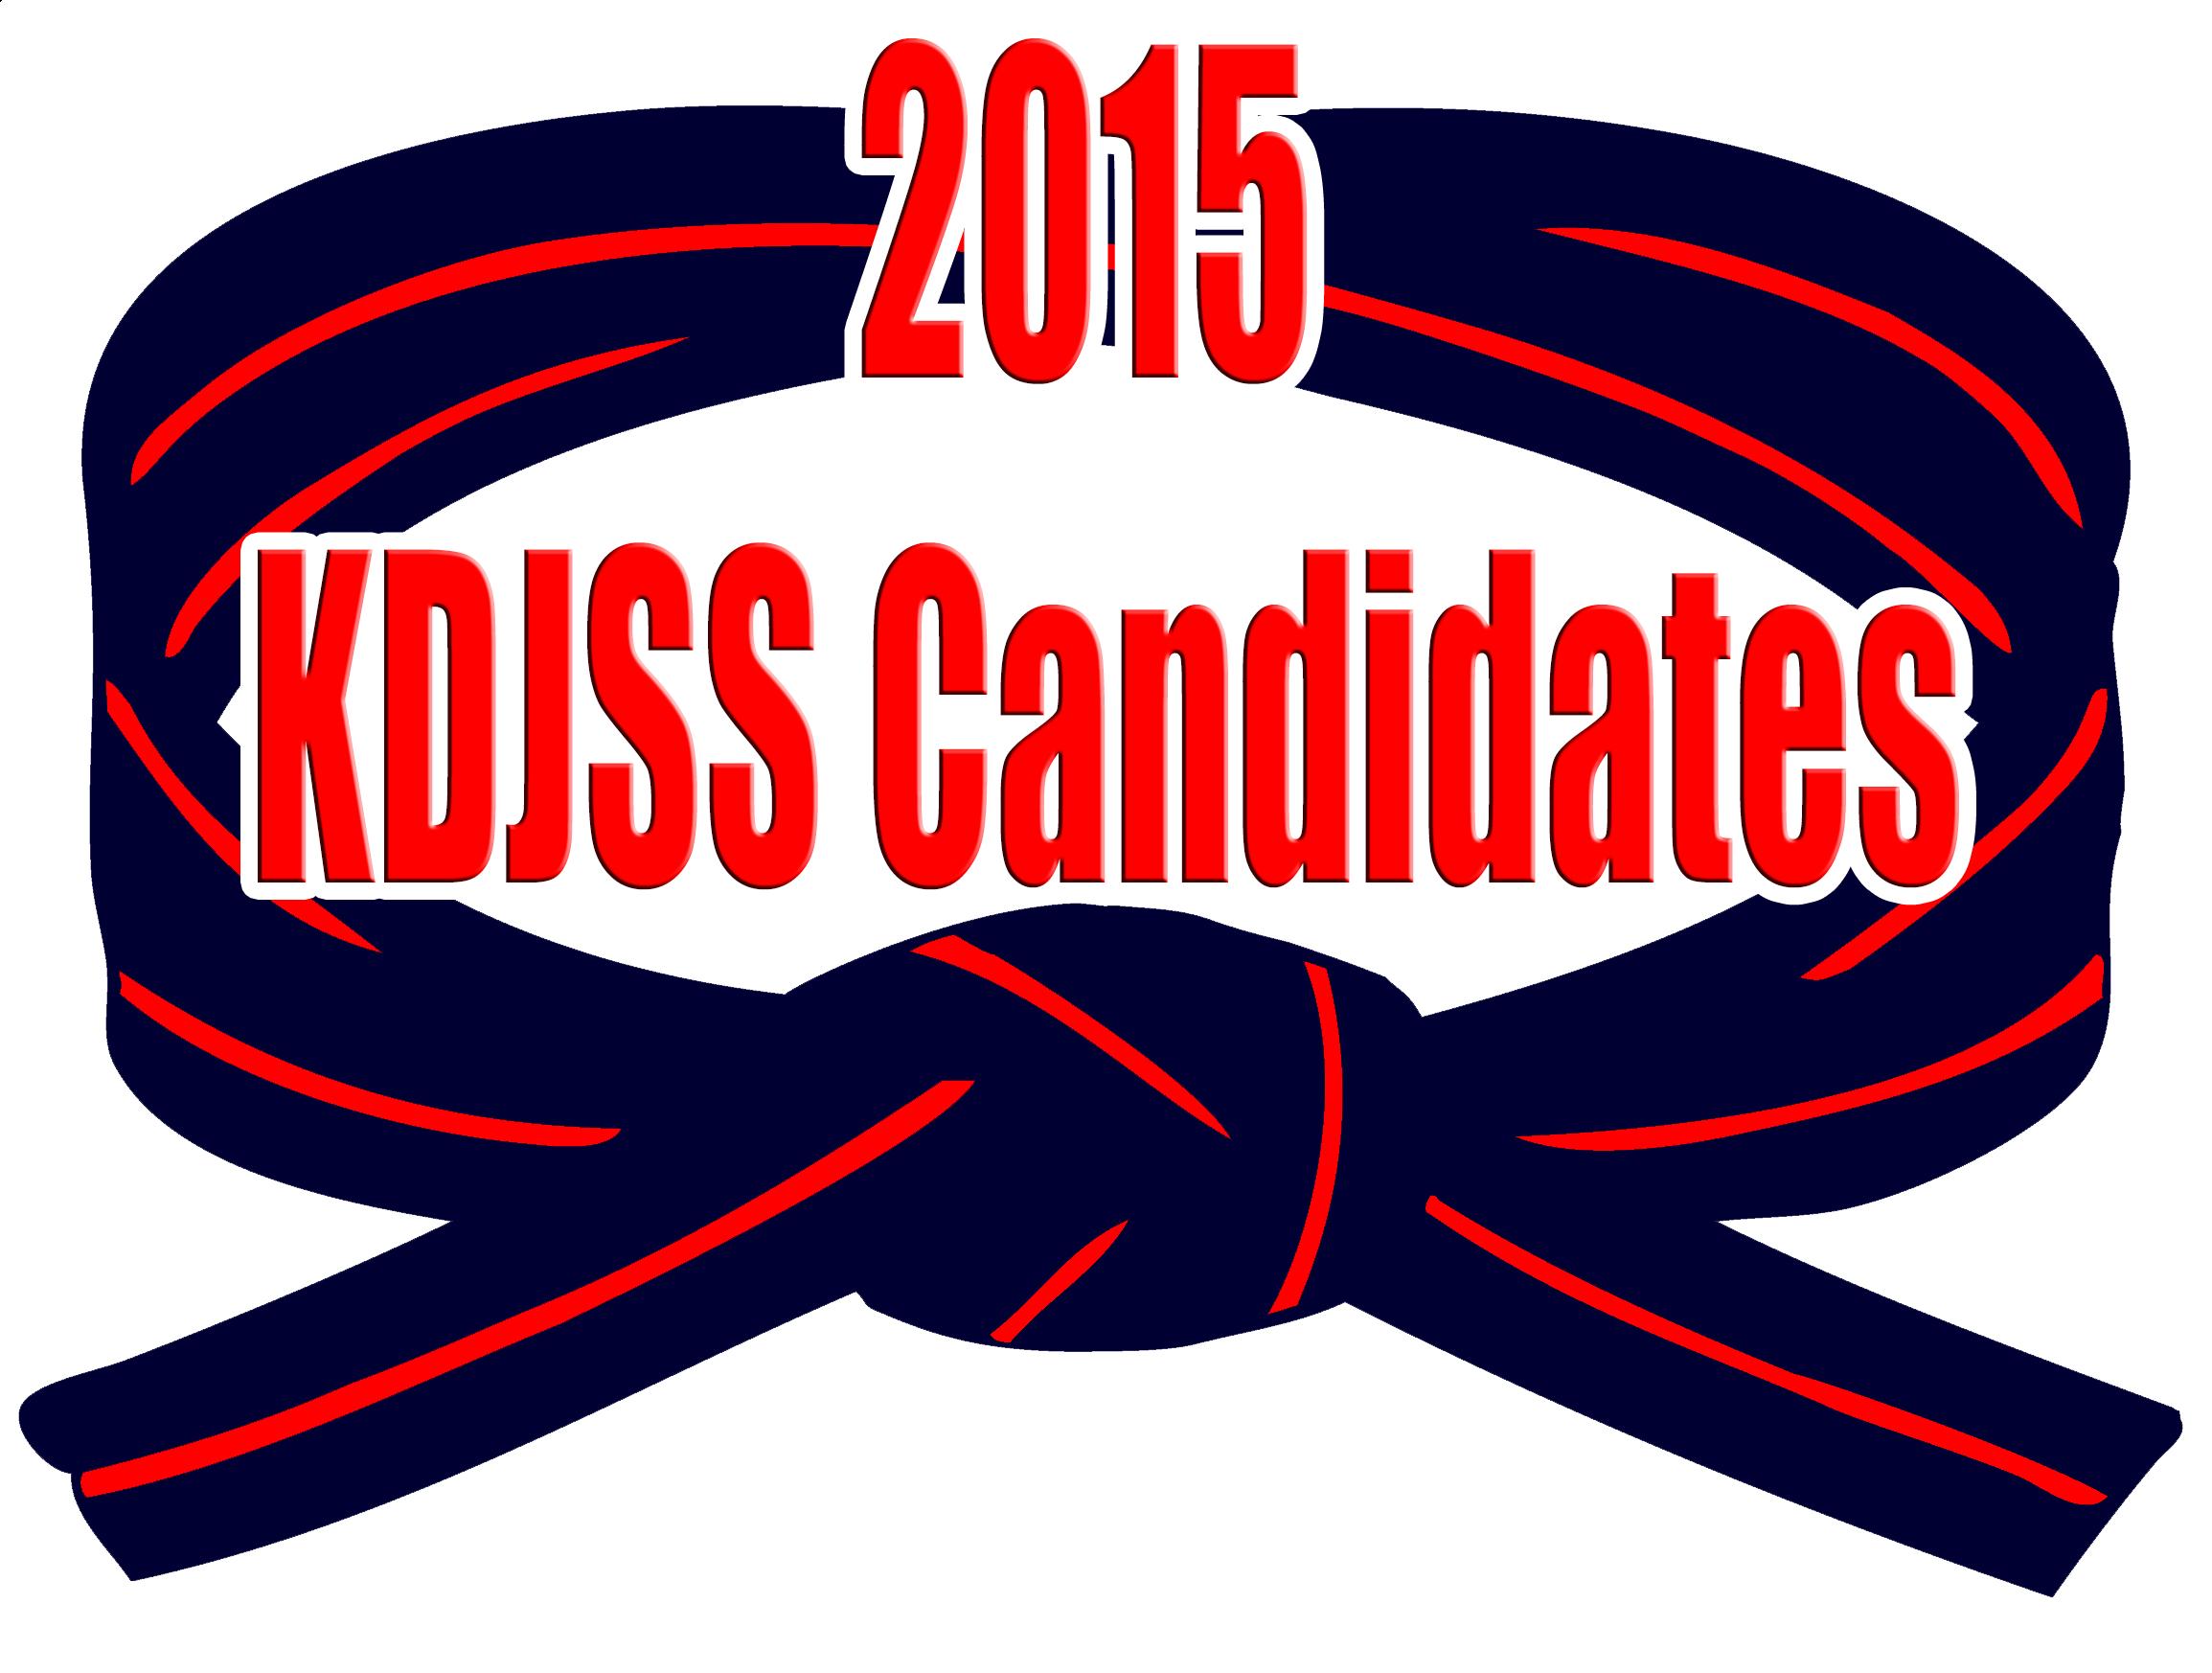 KDJSS Candidates 2015 (Semi-Prv)